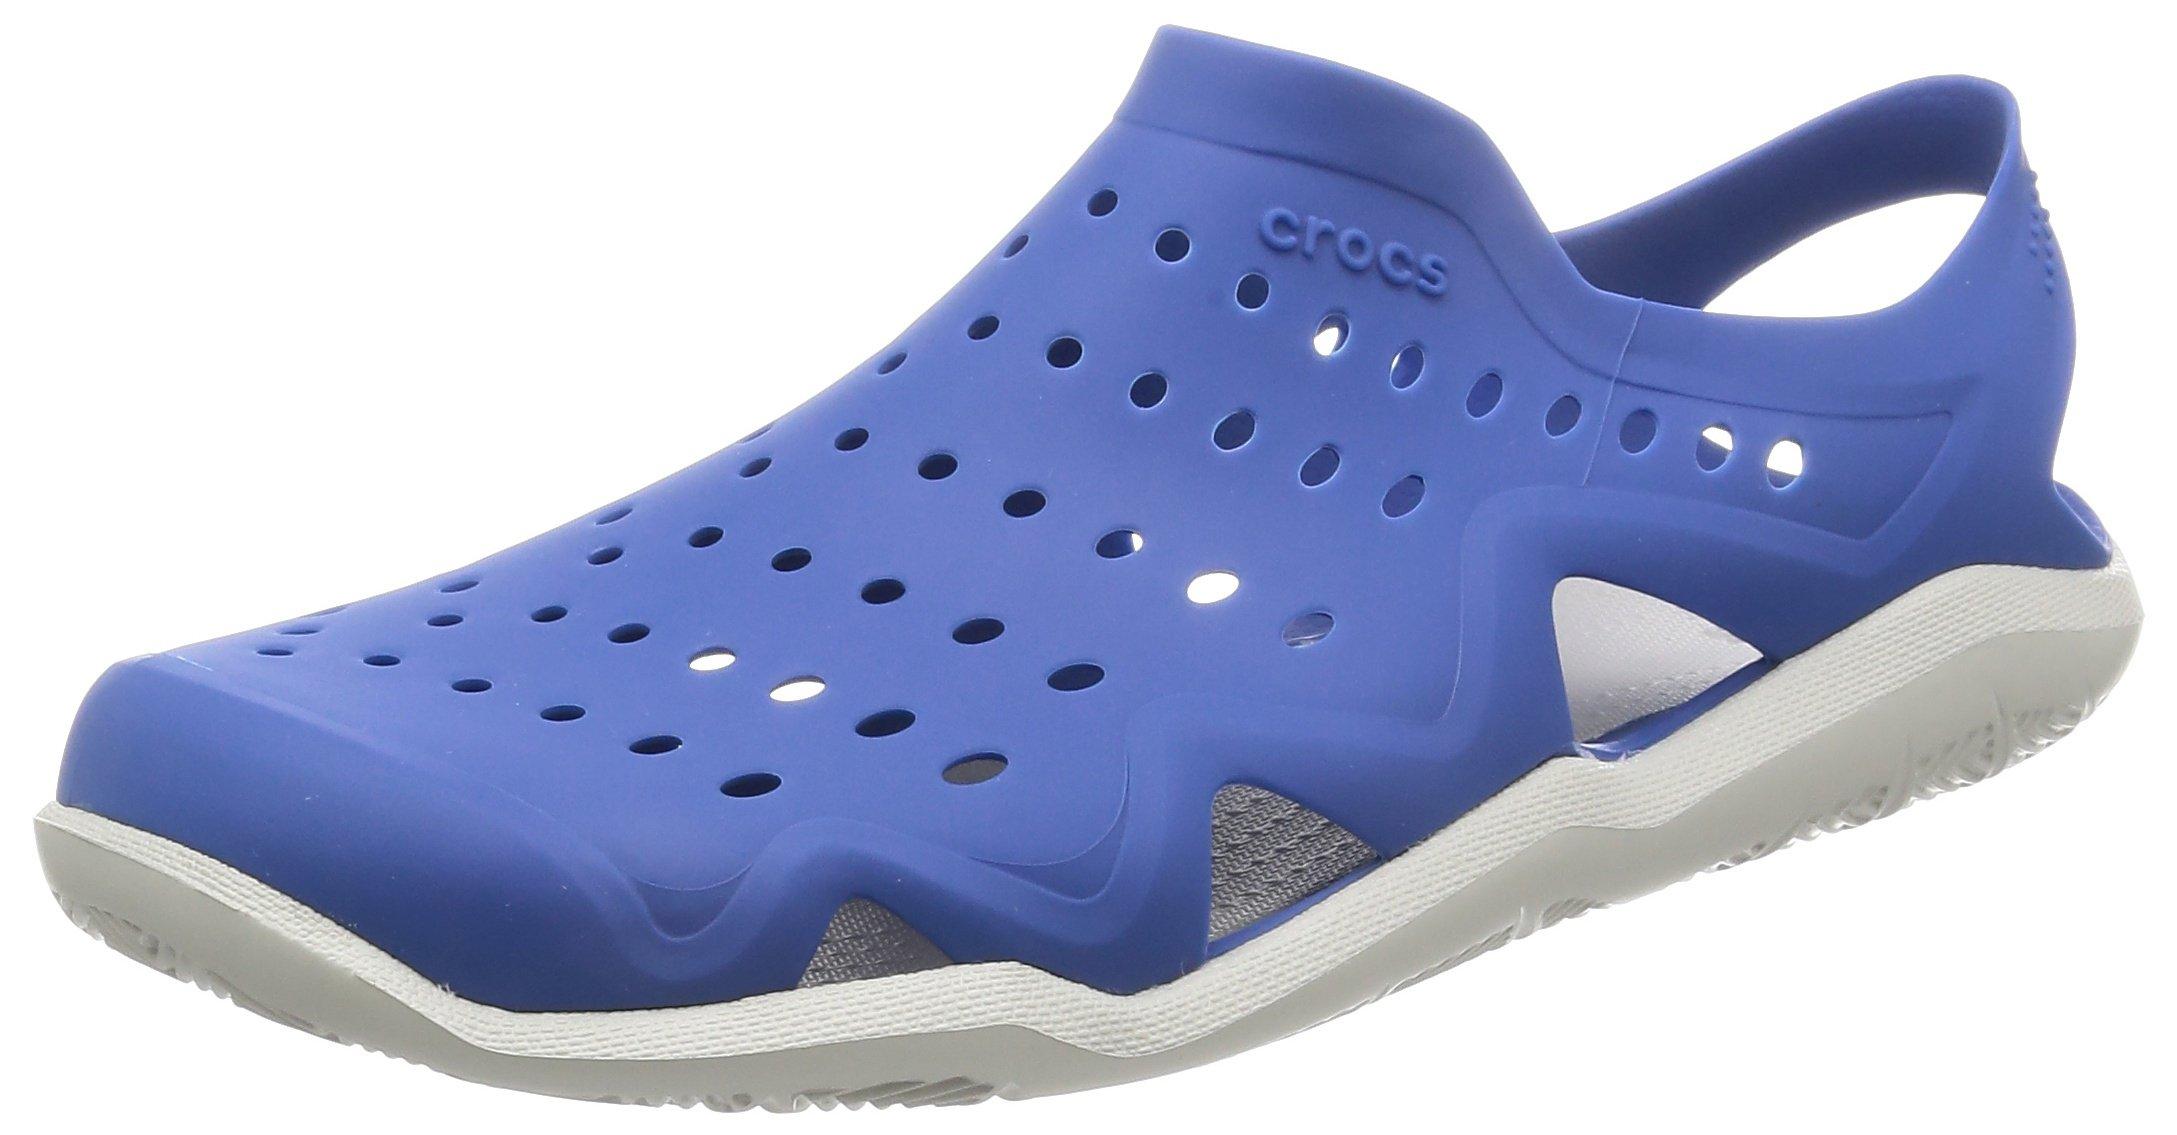 Crocs Men's Swiftwater Wave M Flat,Blue Jean/Pearl White,10 M US by Crocs